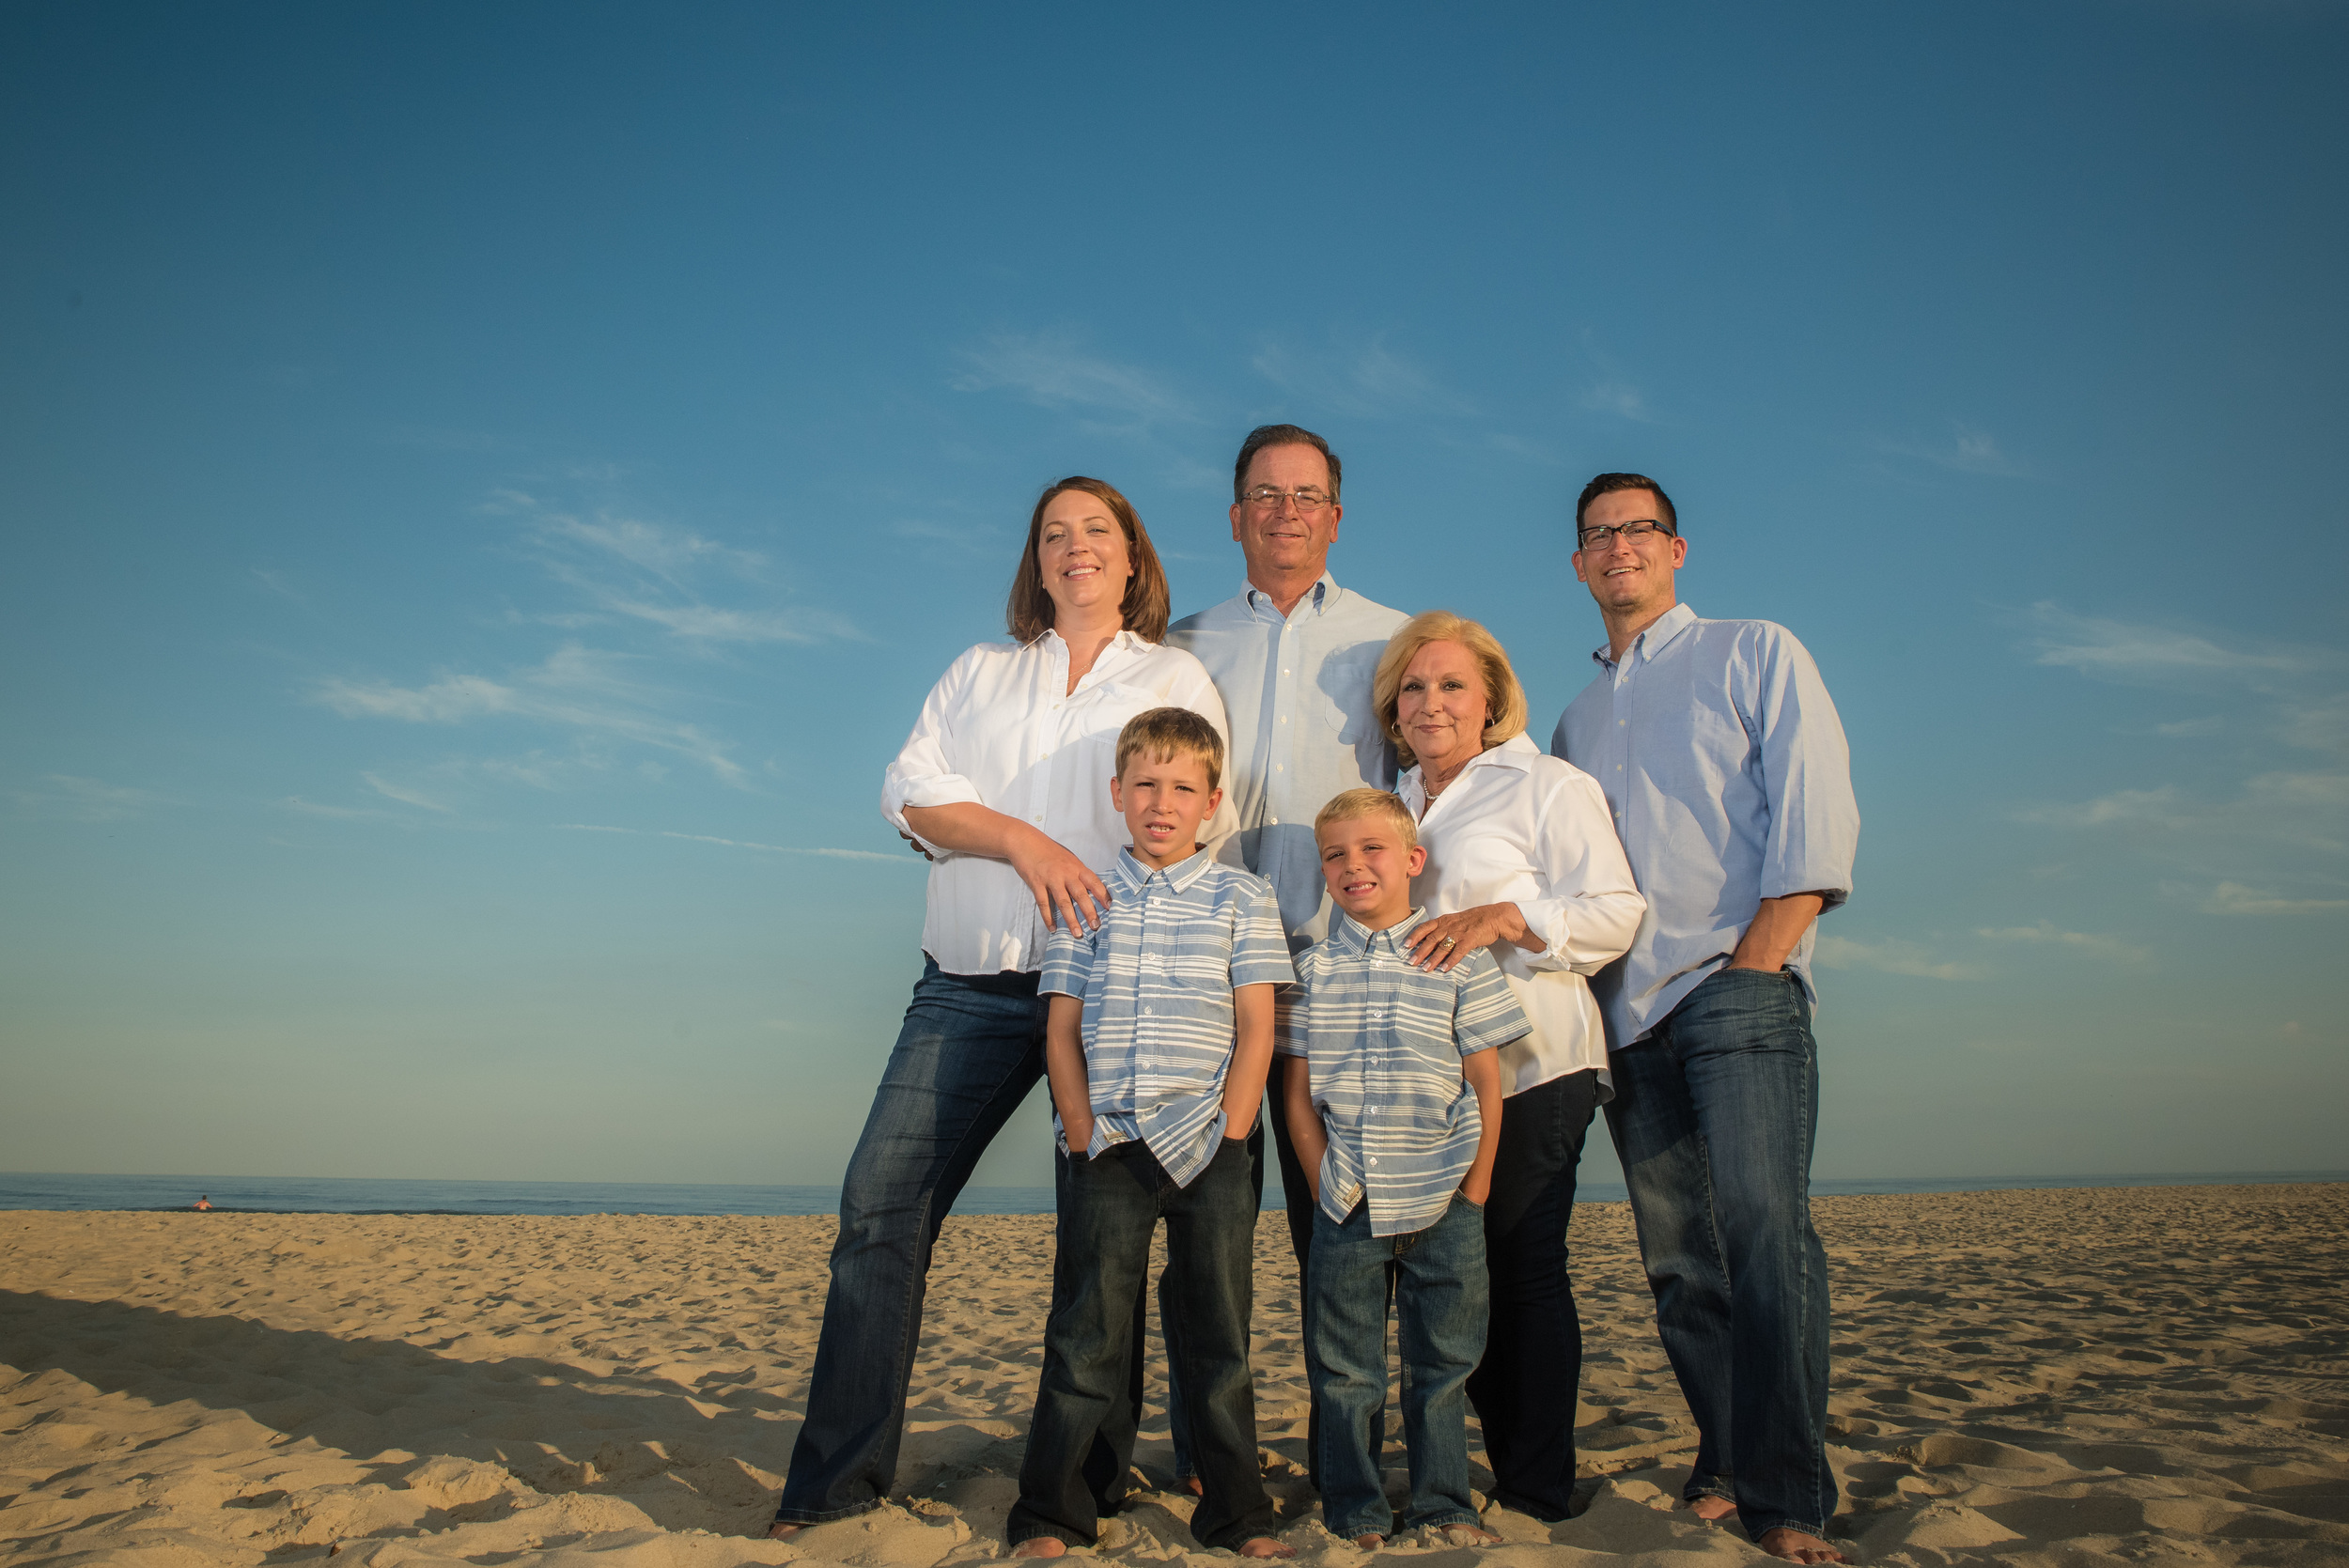 Long Beach Island Family Portraits, Dombrowski 2